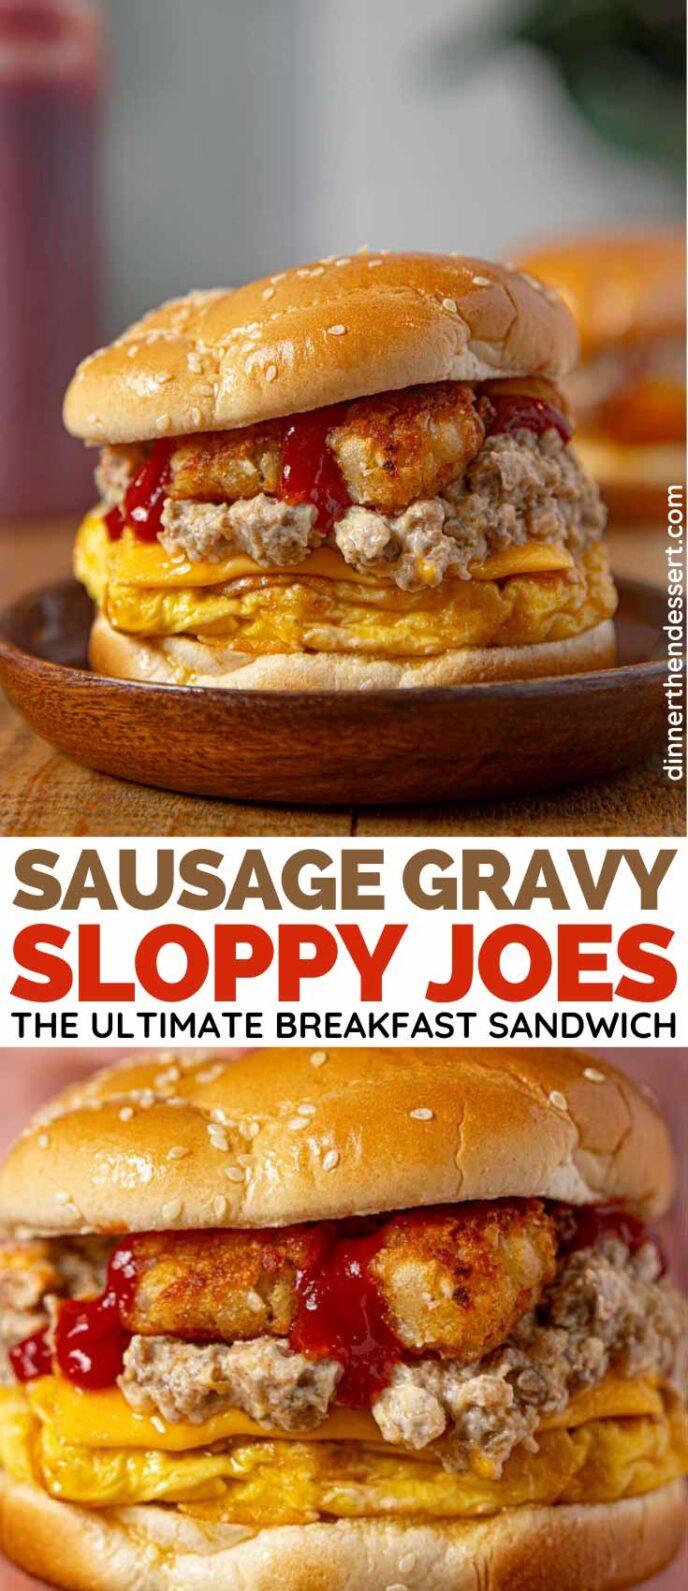 Sausage Gravy Breakfast Sloppy Joes collage